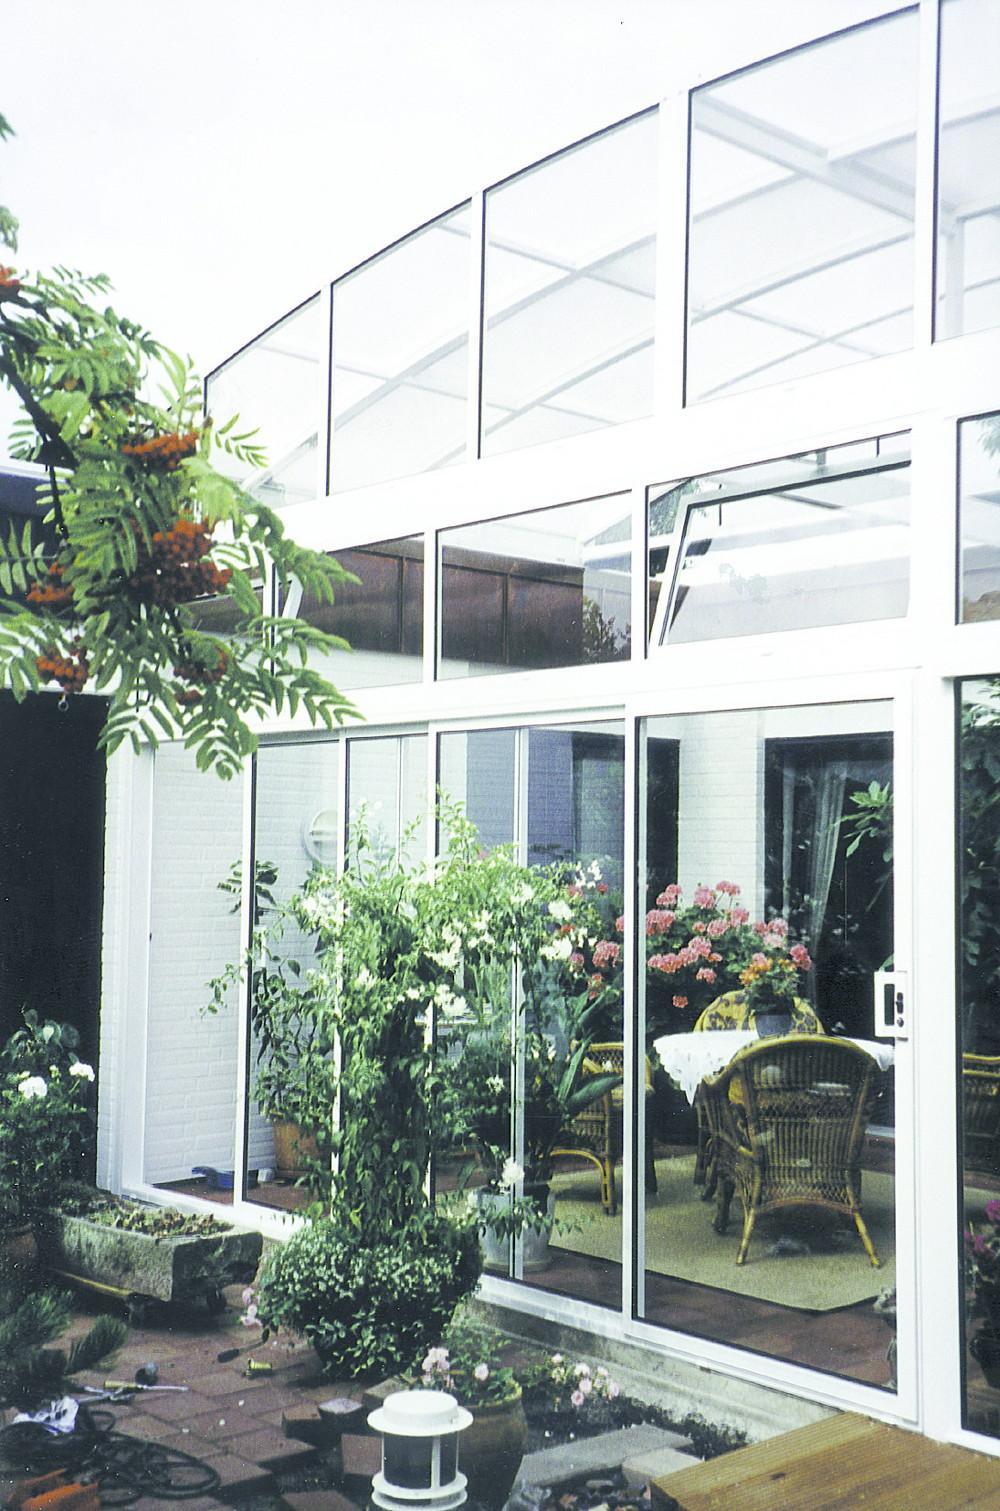 applications/residential/residential-translucent-light-roofs-4.jpg